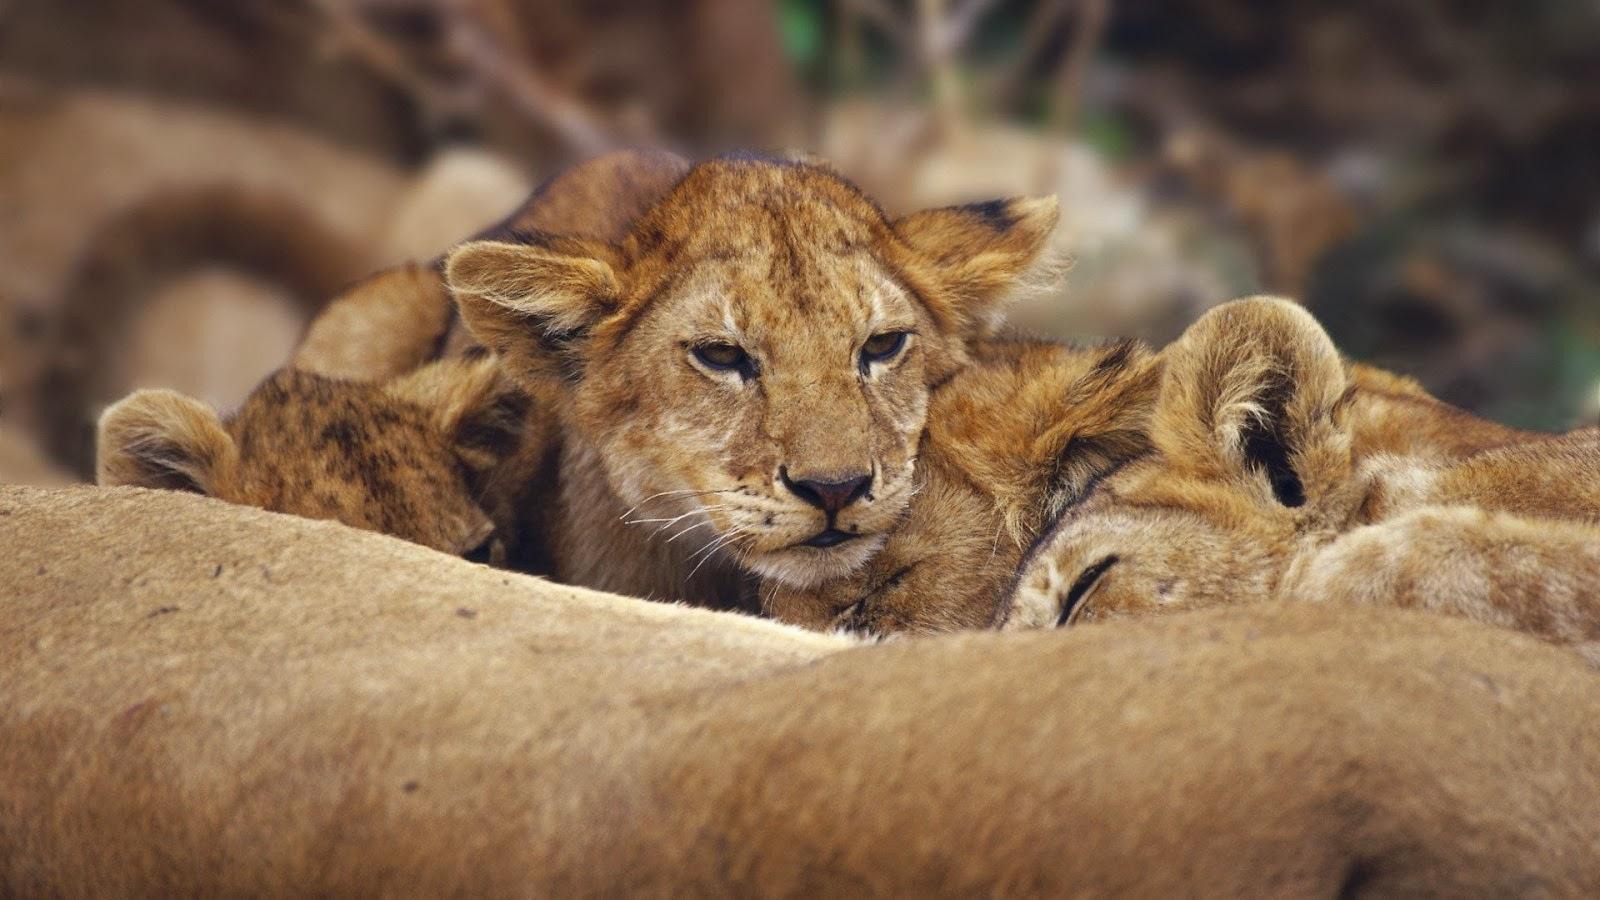 Lions Cubs Full HD Desktop Wallpapers 1080p 1600x900